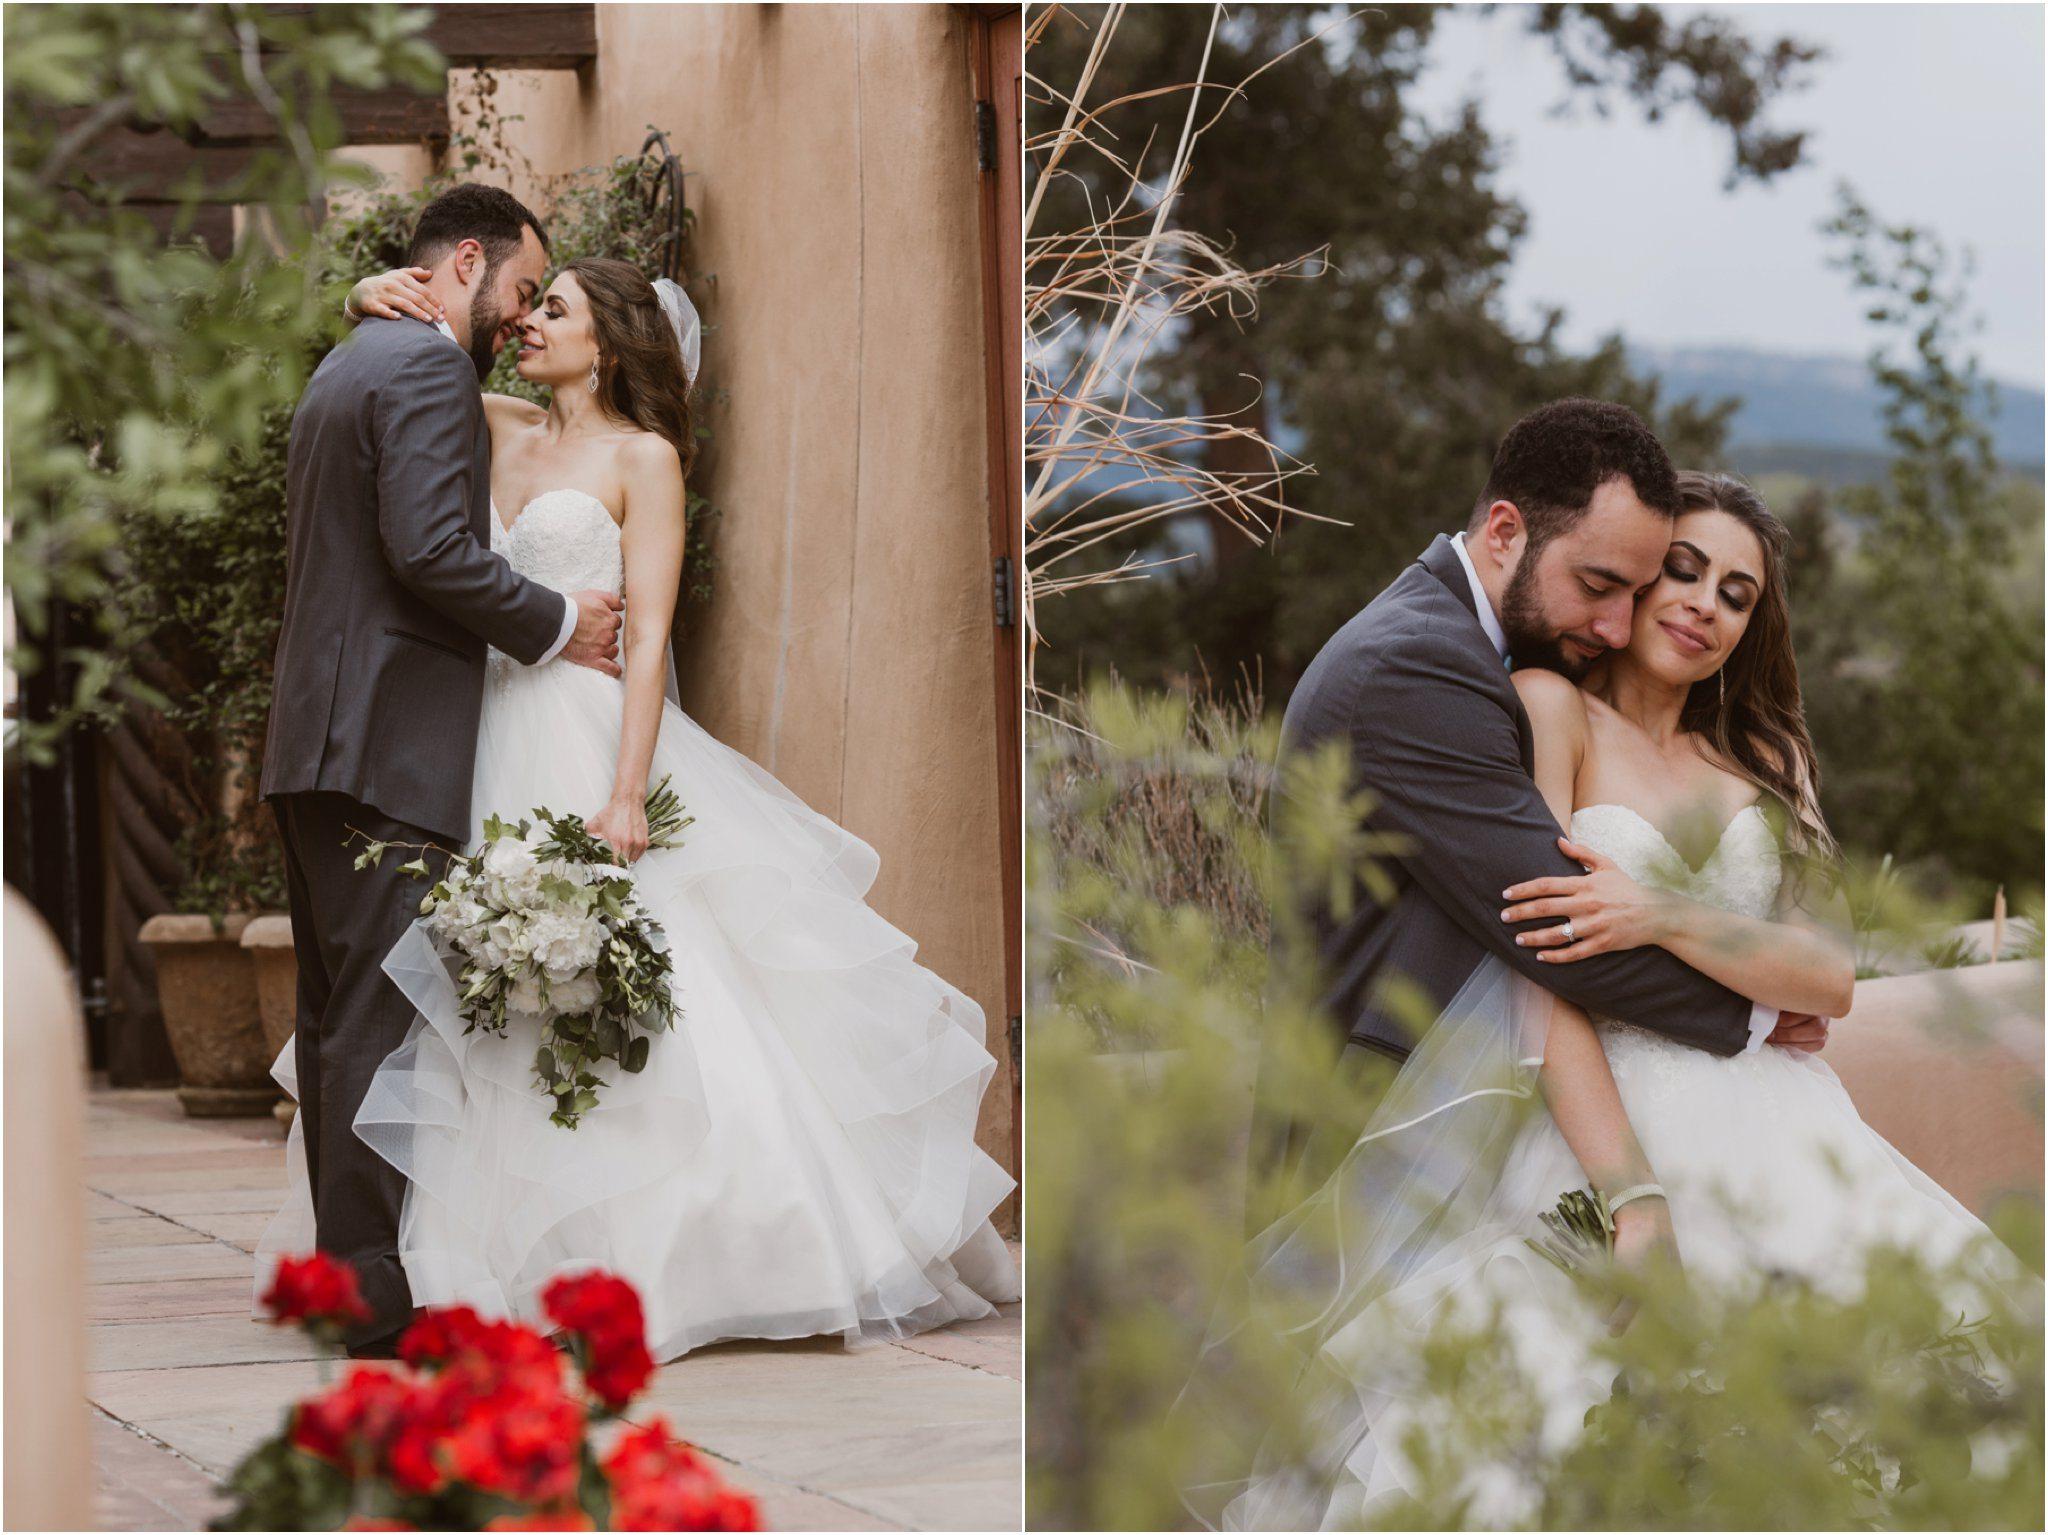 28Blue Rose Photography_ Albuquerque_ Santa Fe_ New Mexico wedding photographers